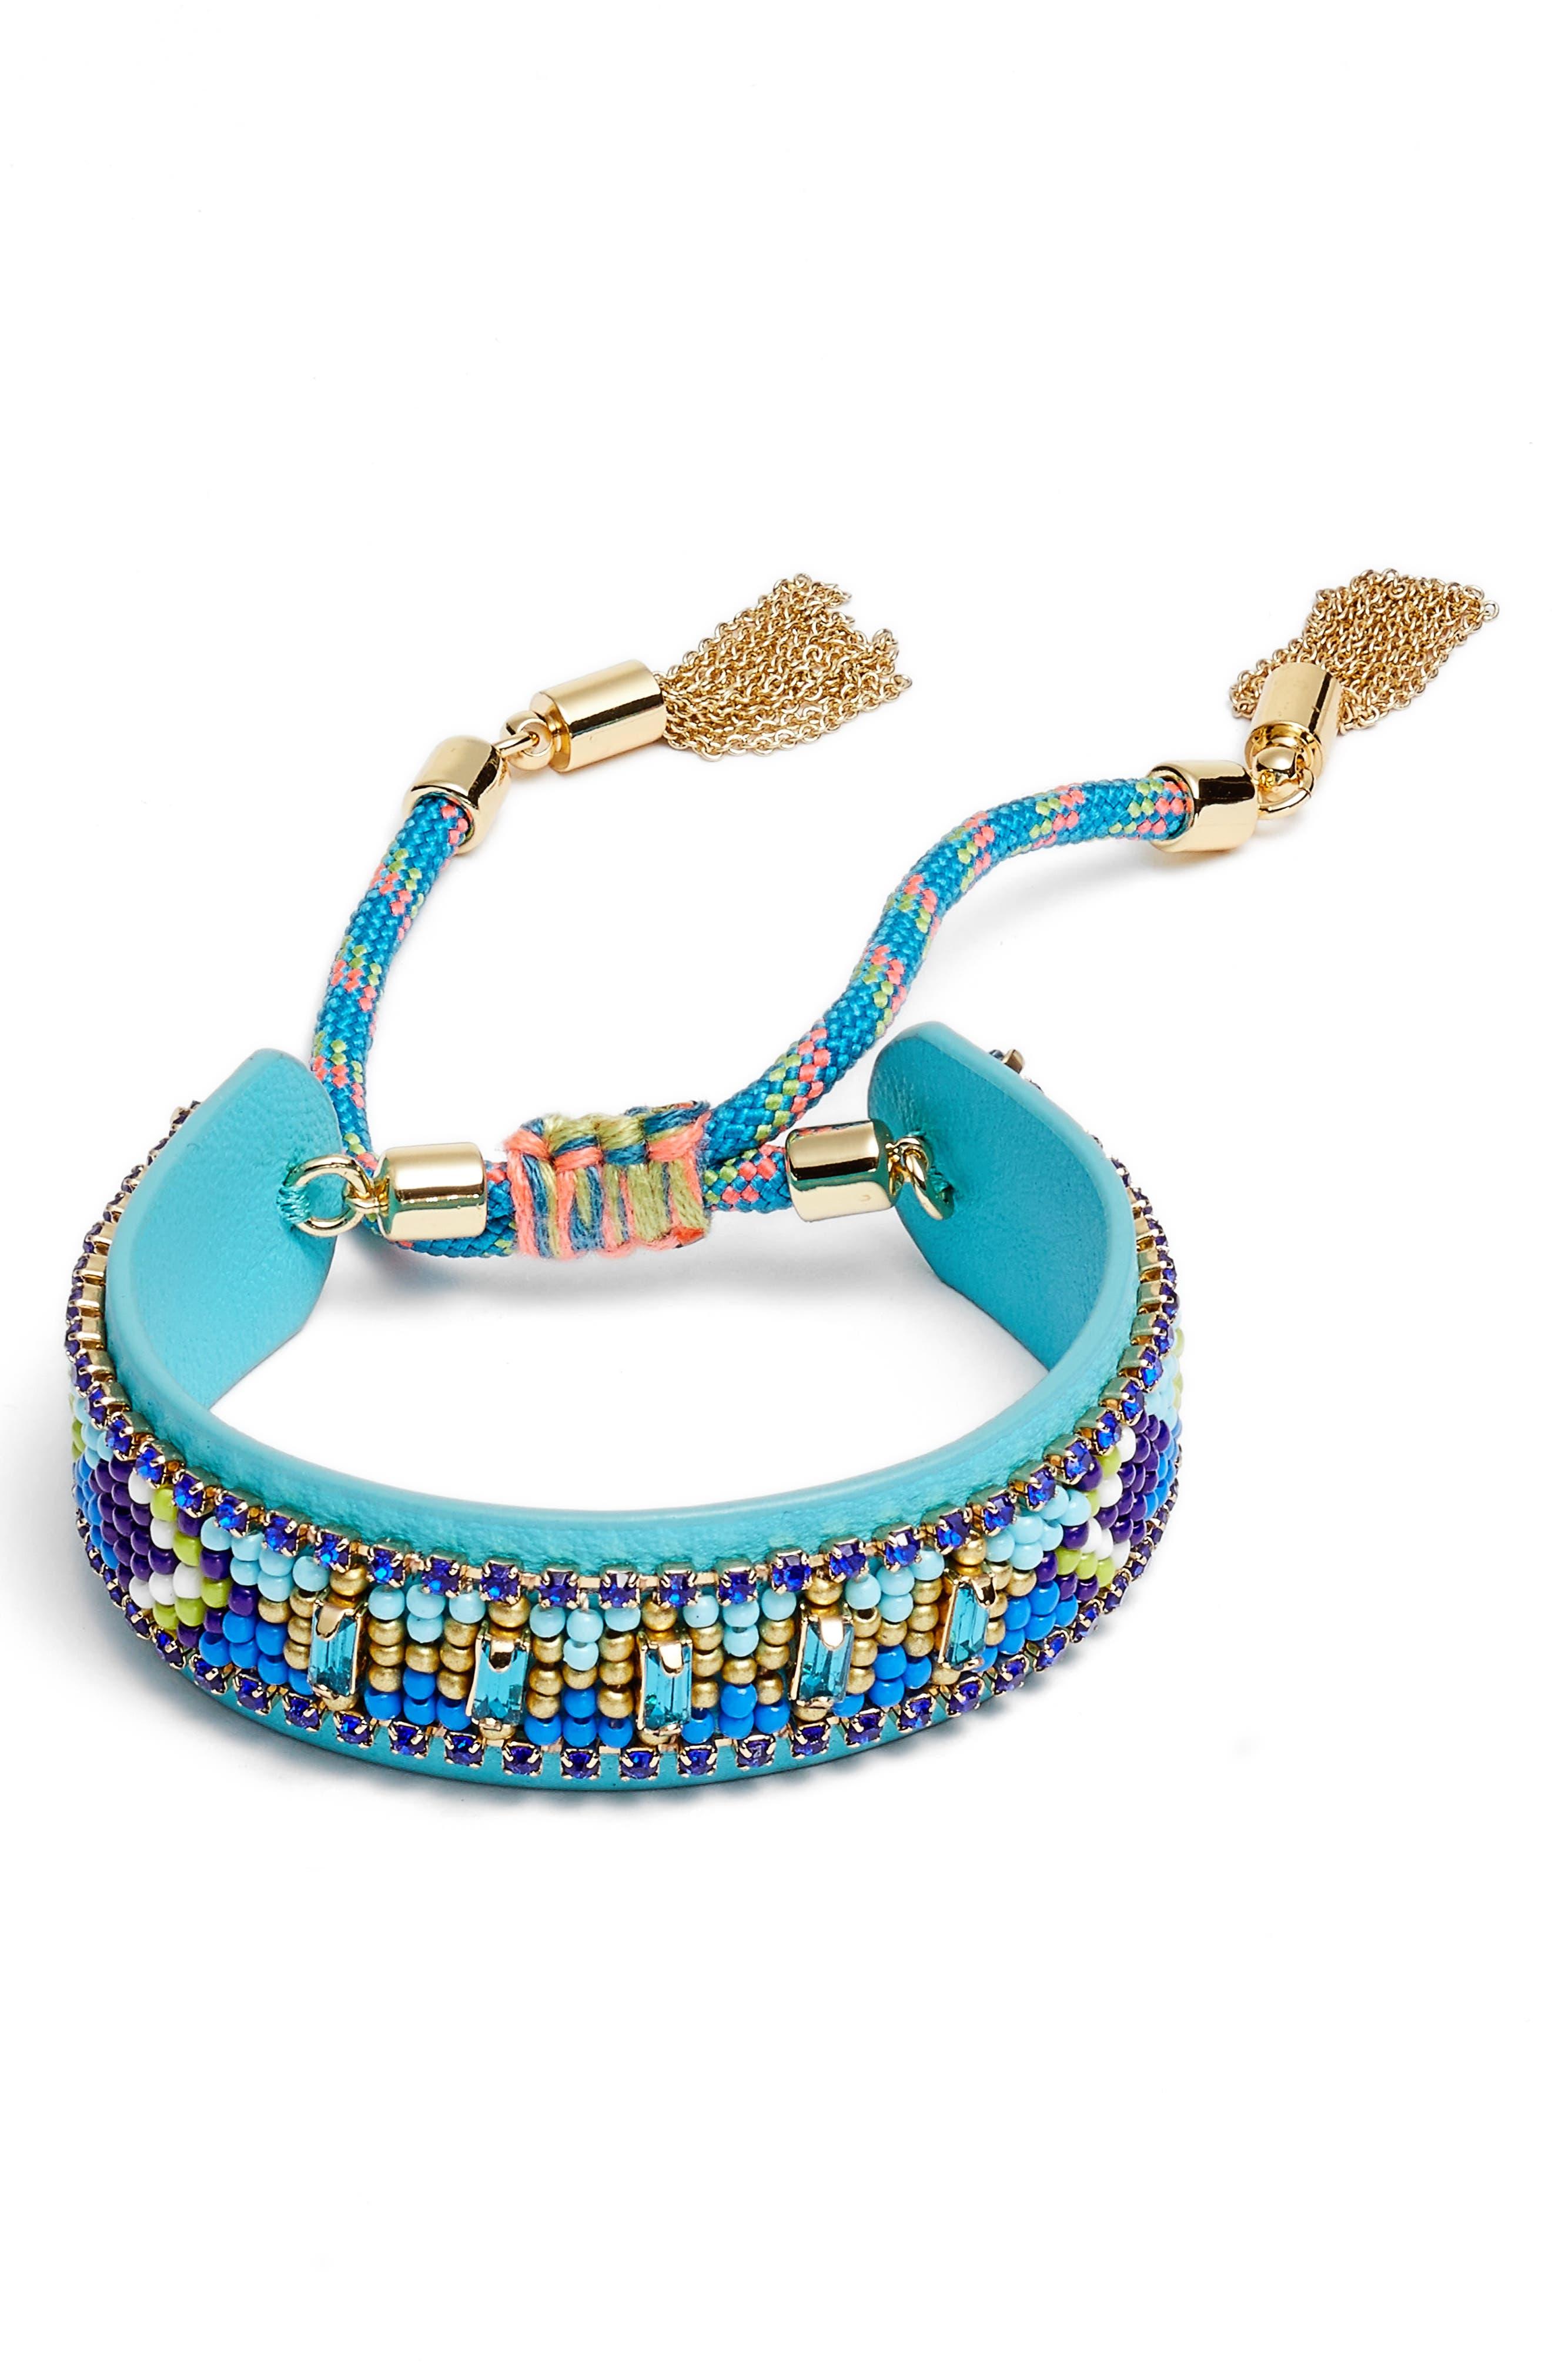 Zigzag Beaded Leather Friendship Bracelet,                         Main,                         color,